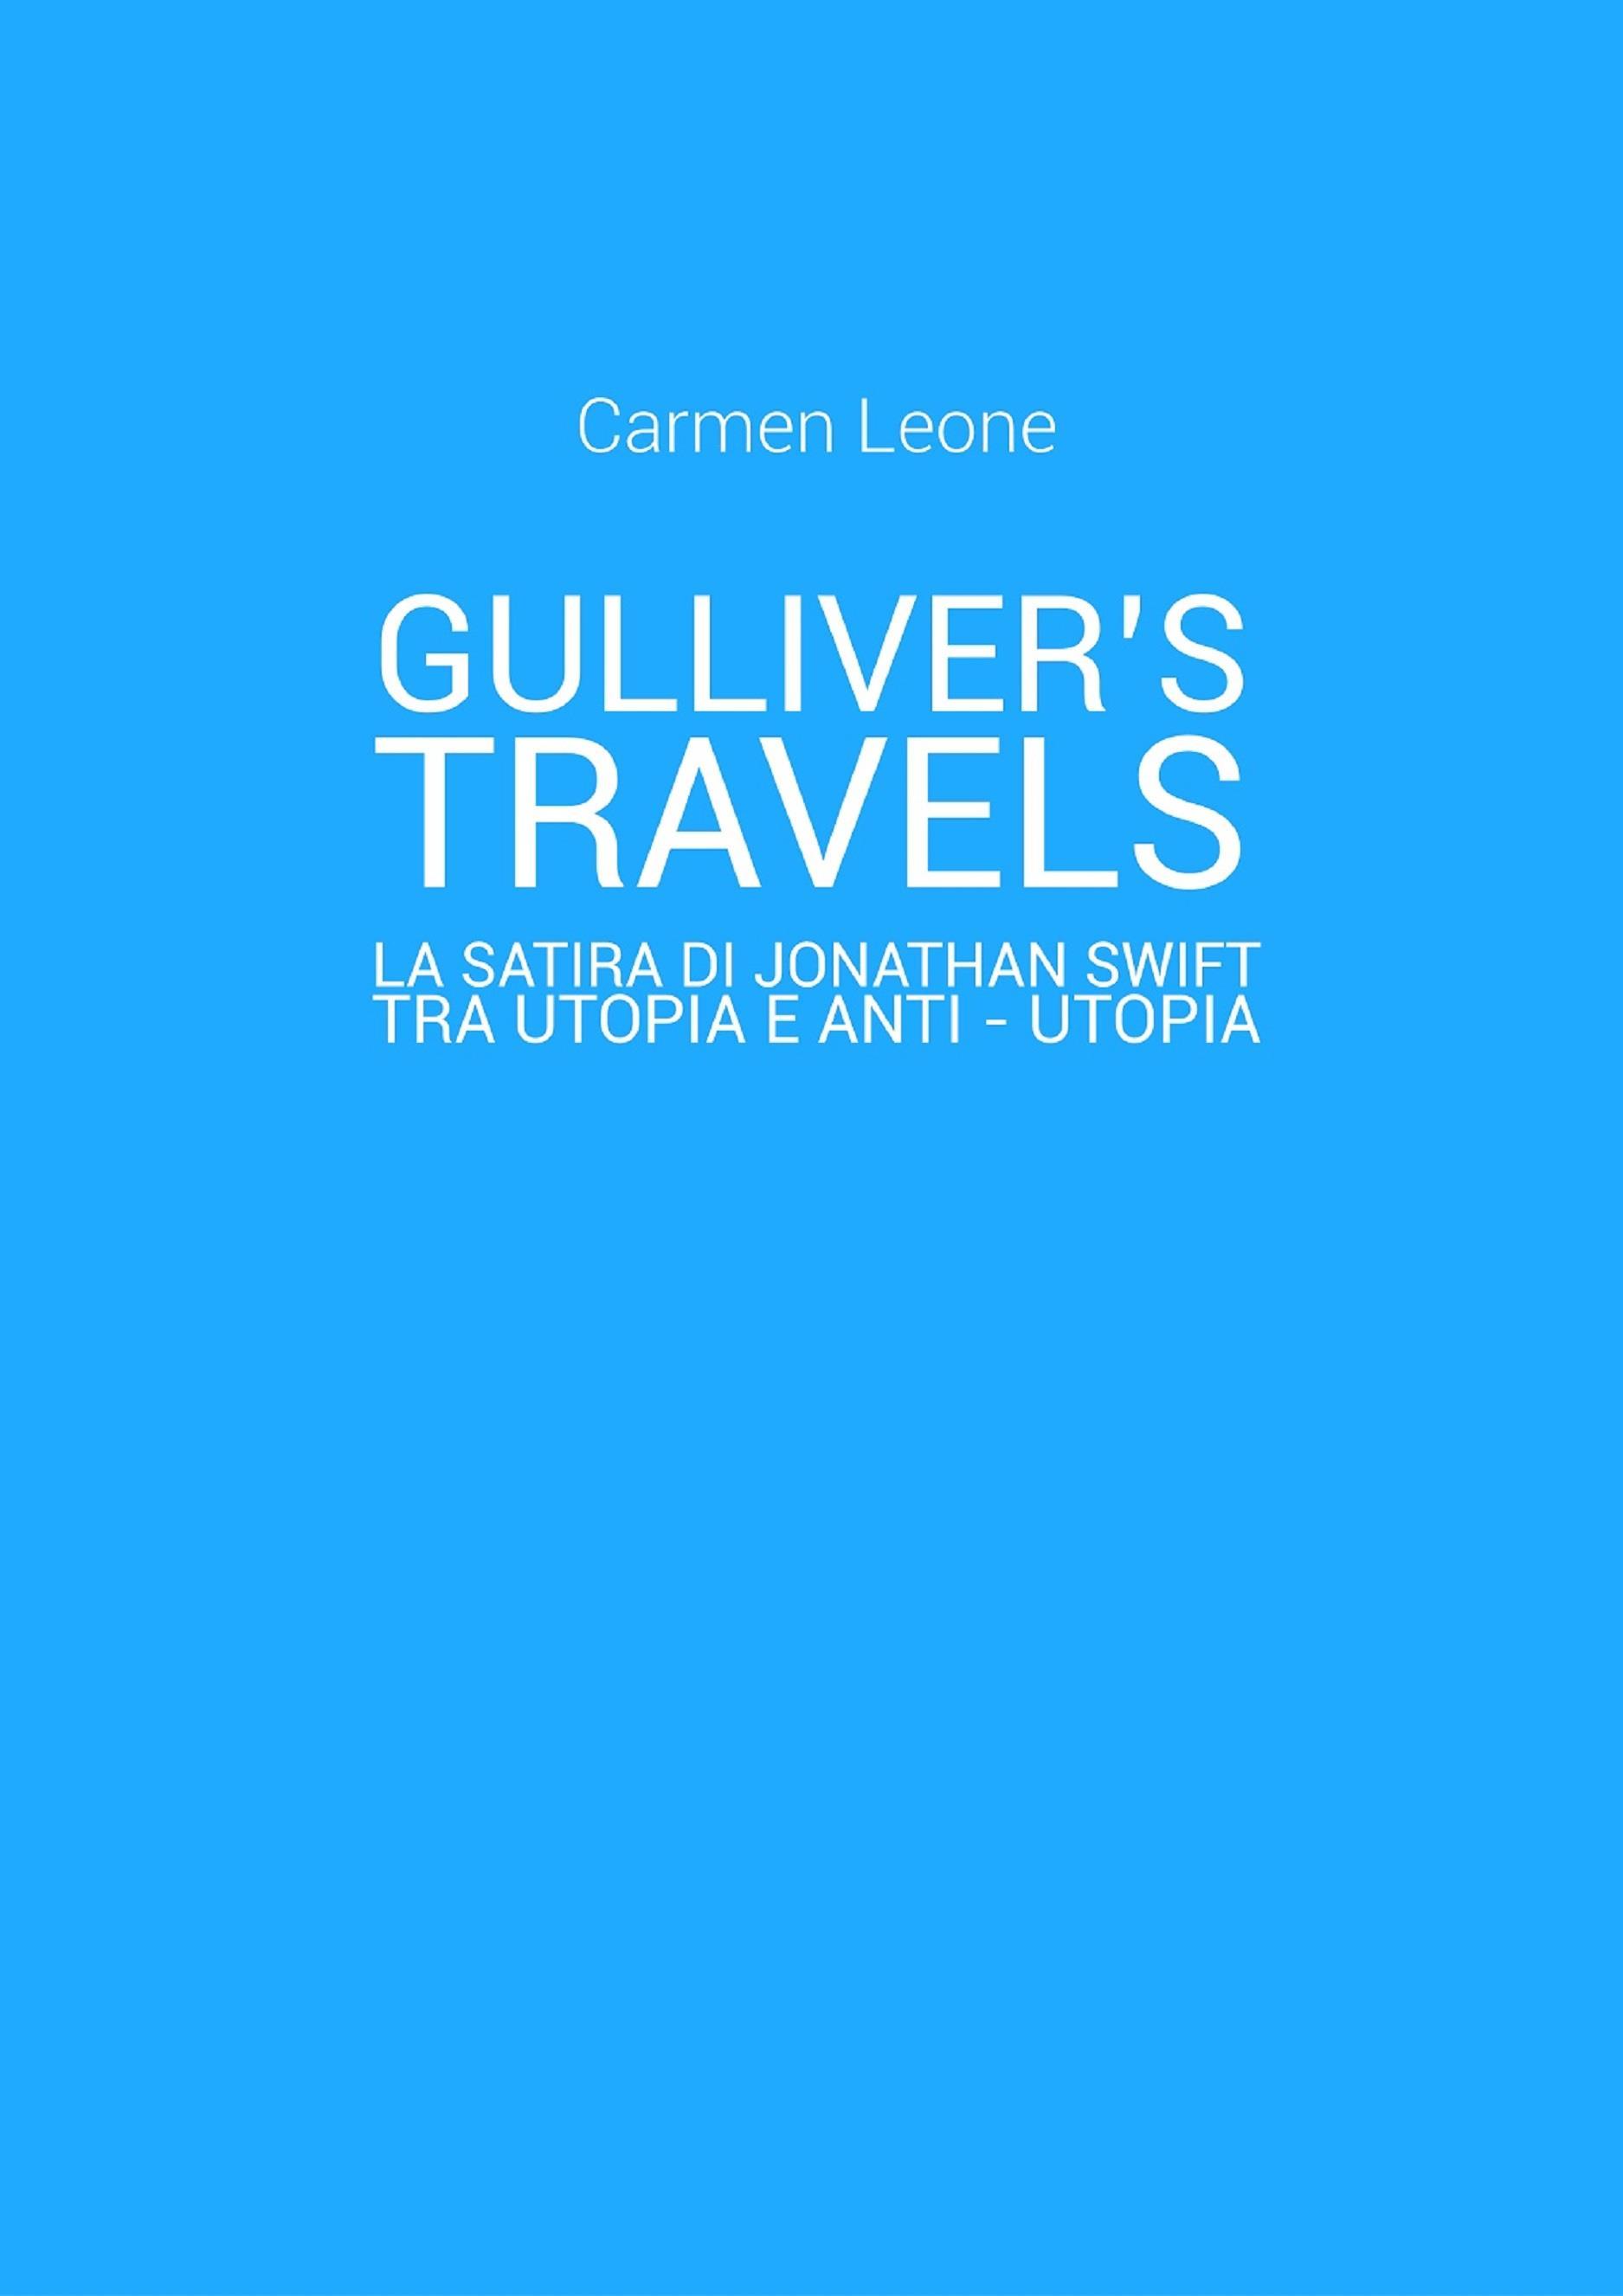 Gulliver's Travels: la satira di Jonathan Swift tra utopia e anti - utopia